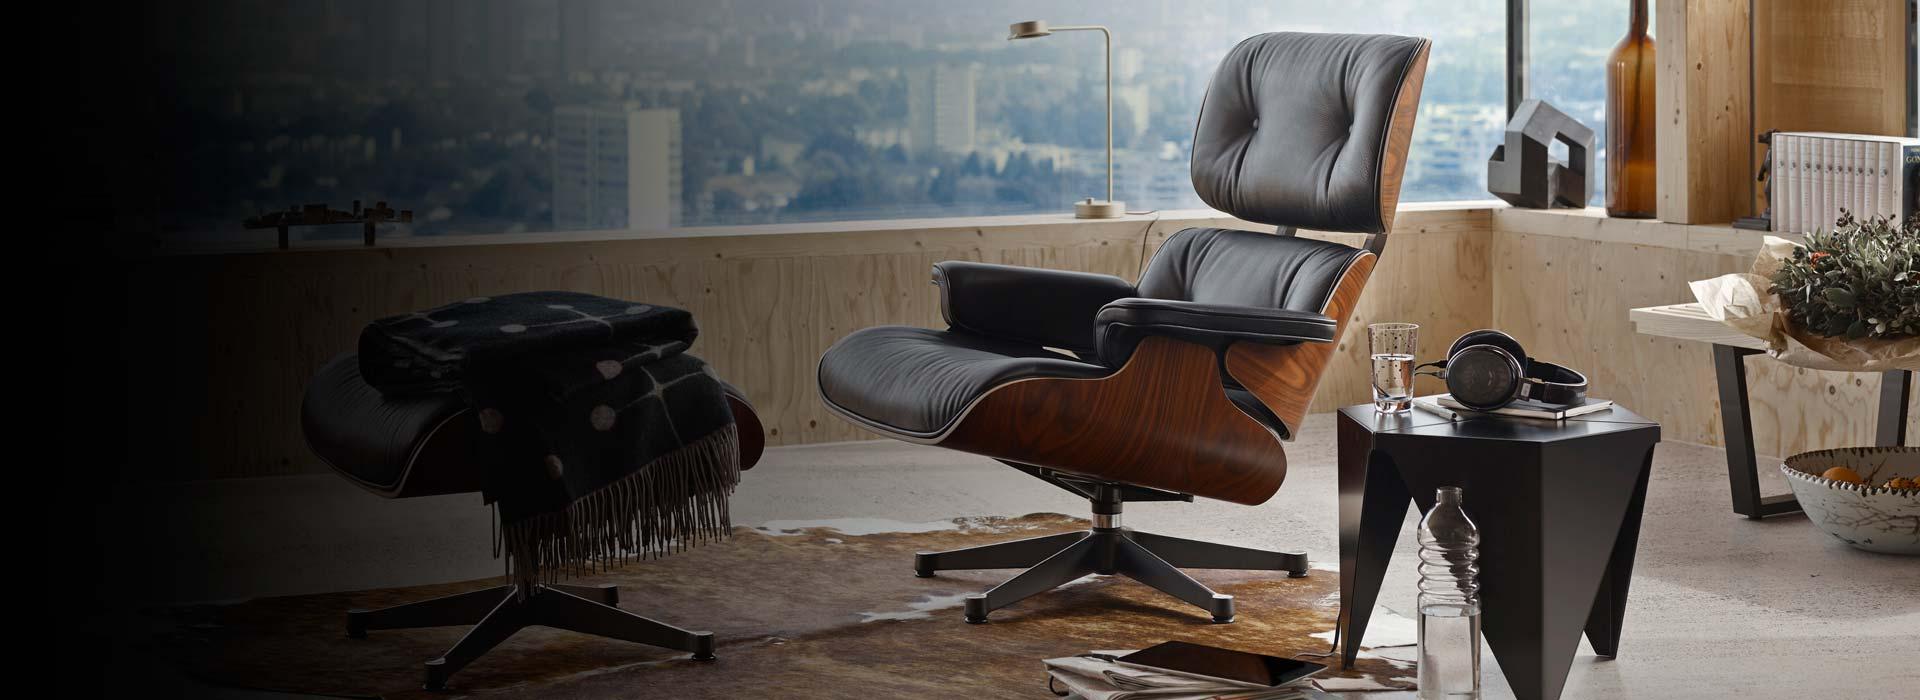 vitra lounge chair + geschenk